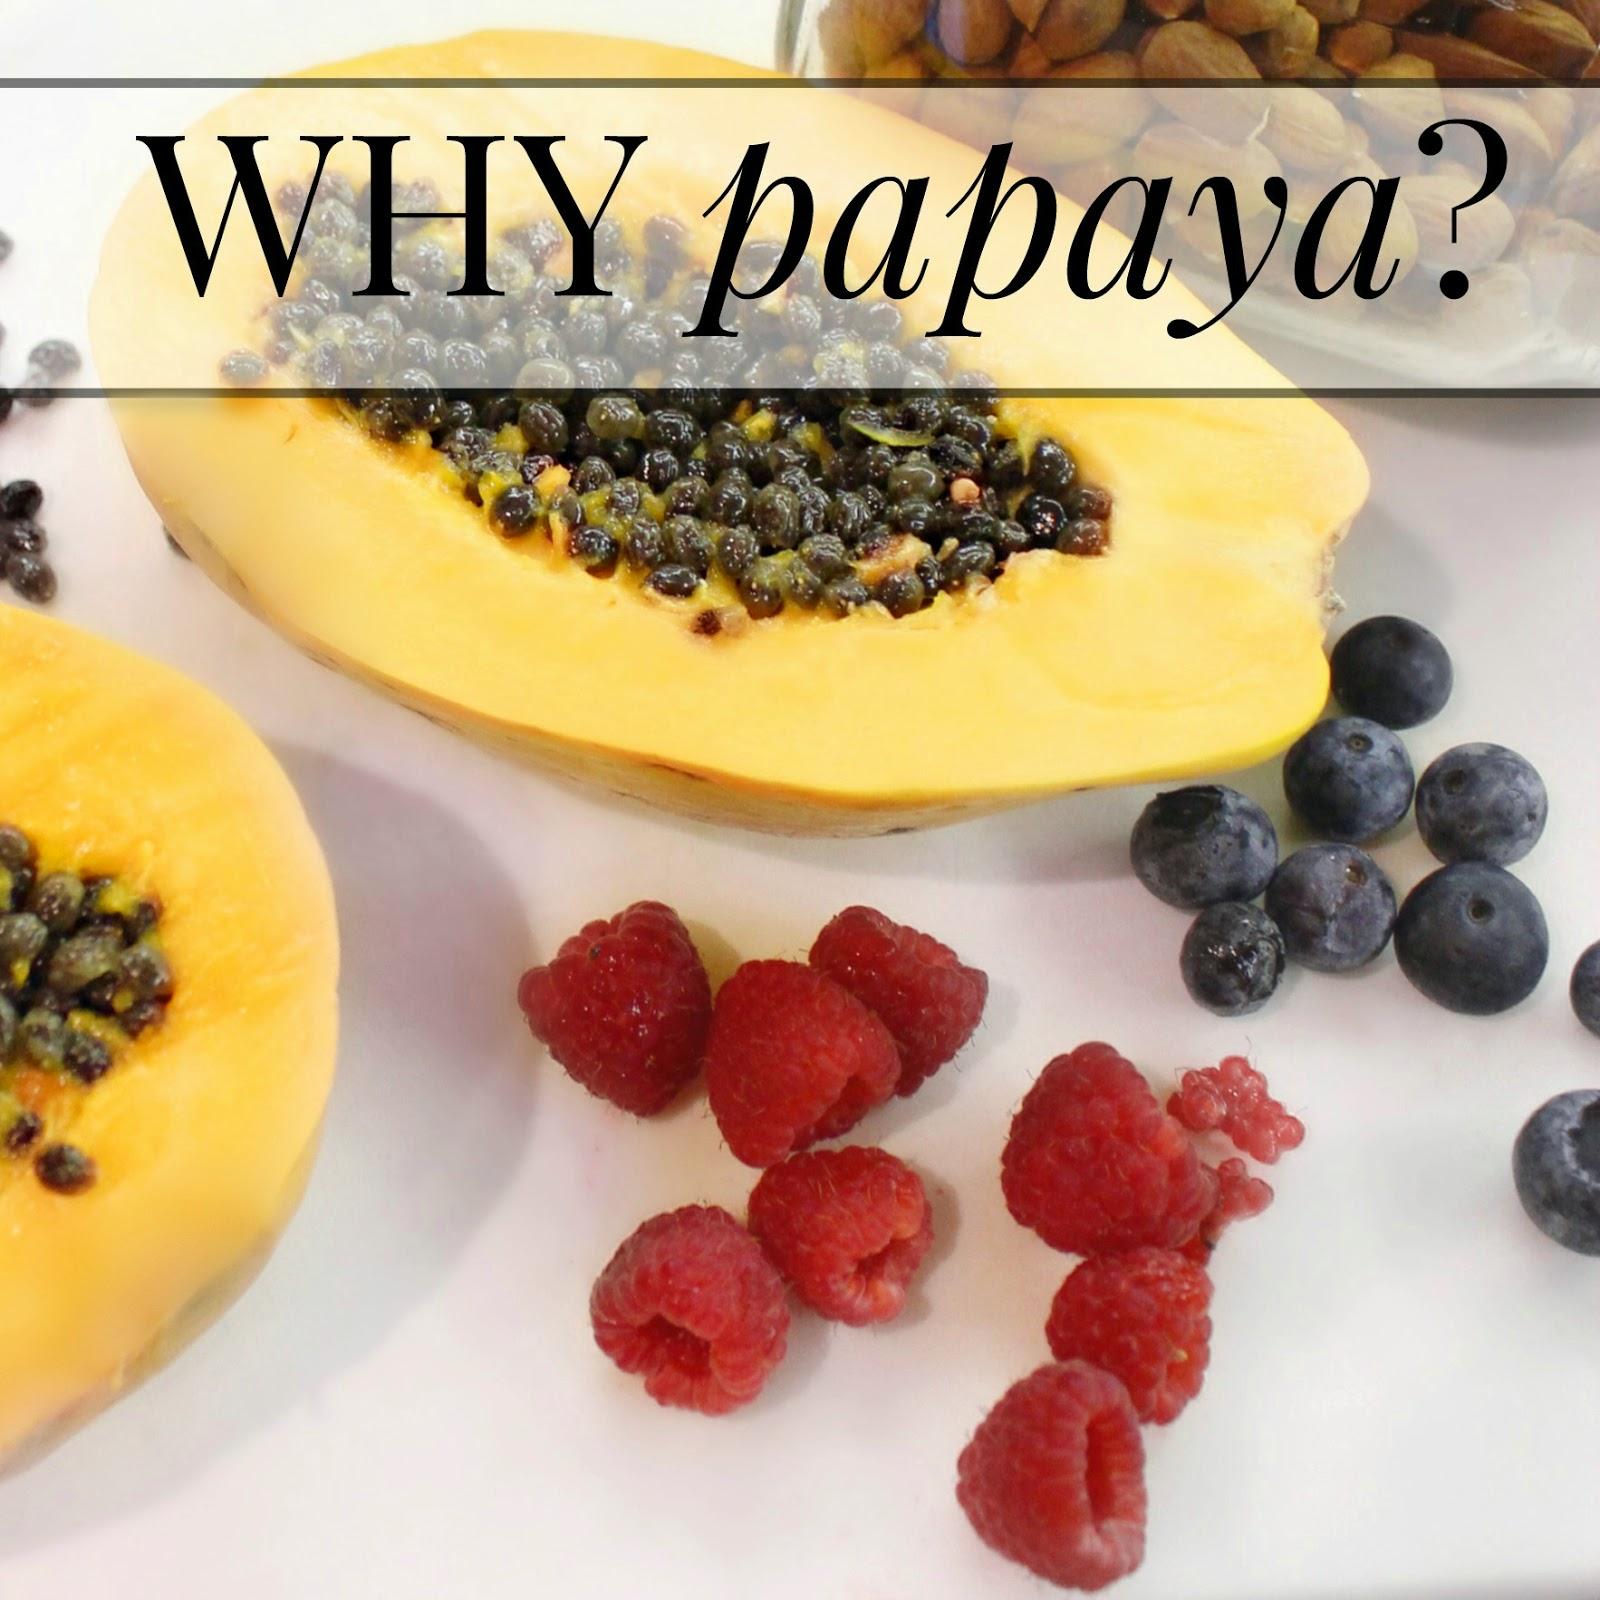 http://www.mepoopsie.com/2014/08/why-papaya.html